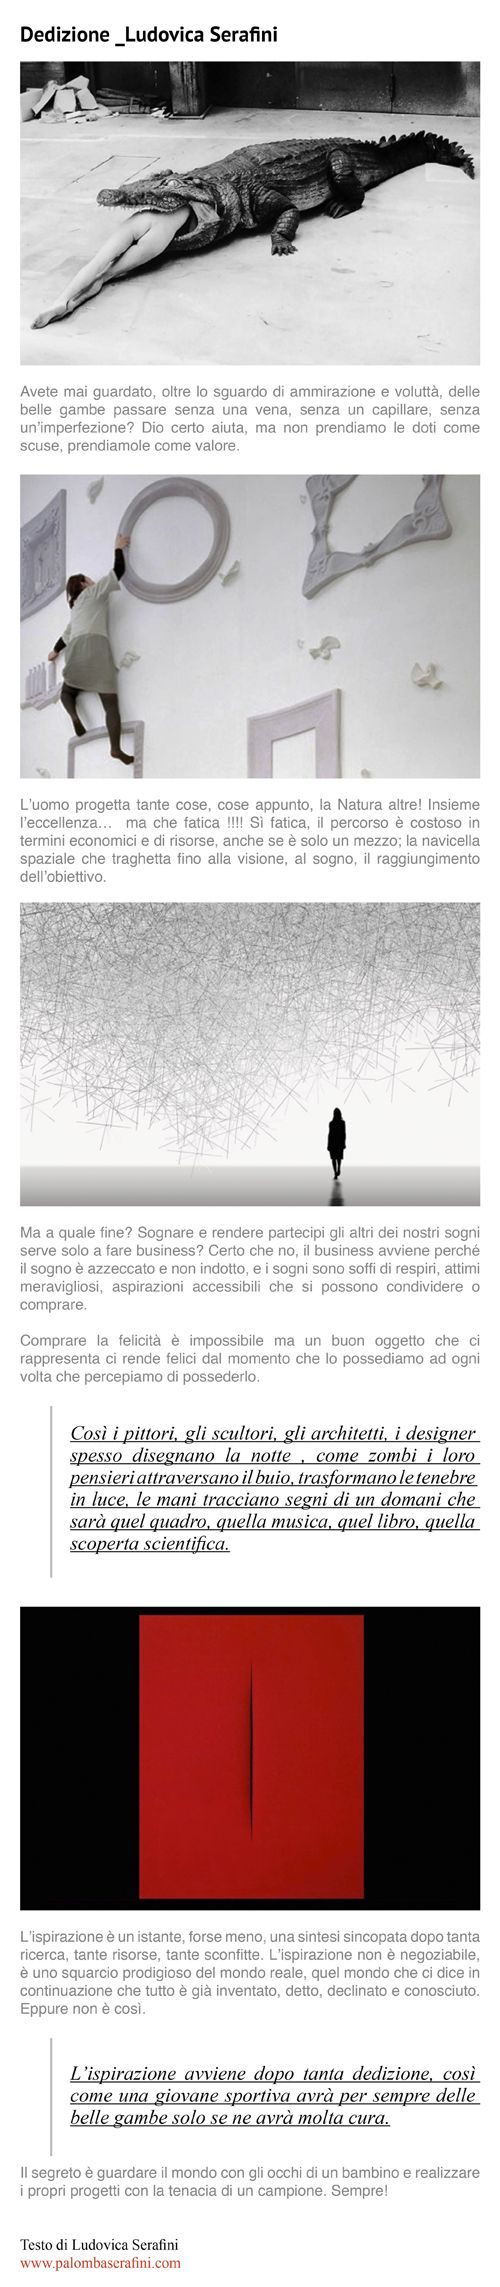 June 28th 2013 | Ludovica Palomba #blog for @casatrend+ | #design http://www.casatrendmag.it/1425/